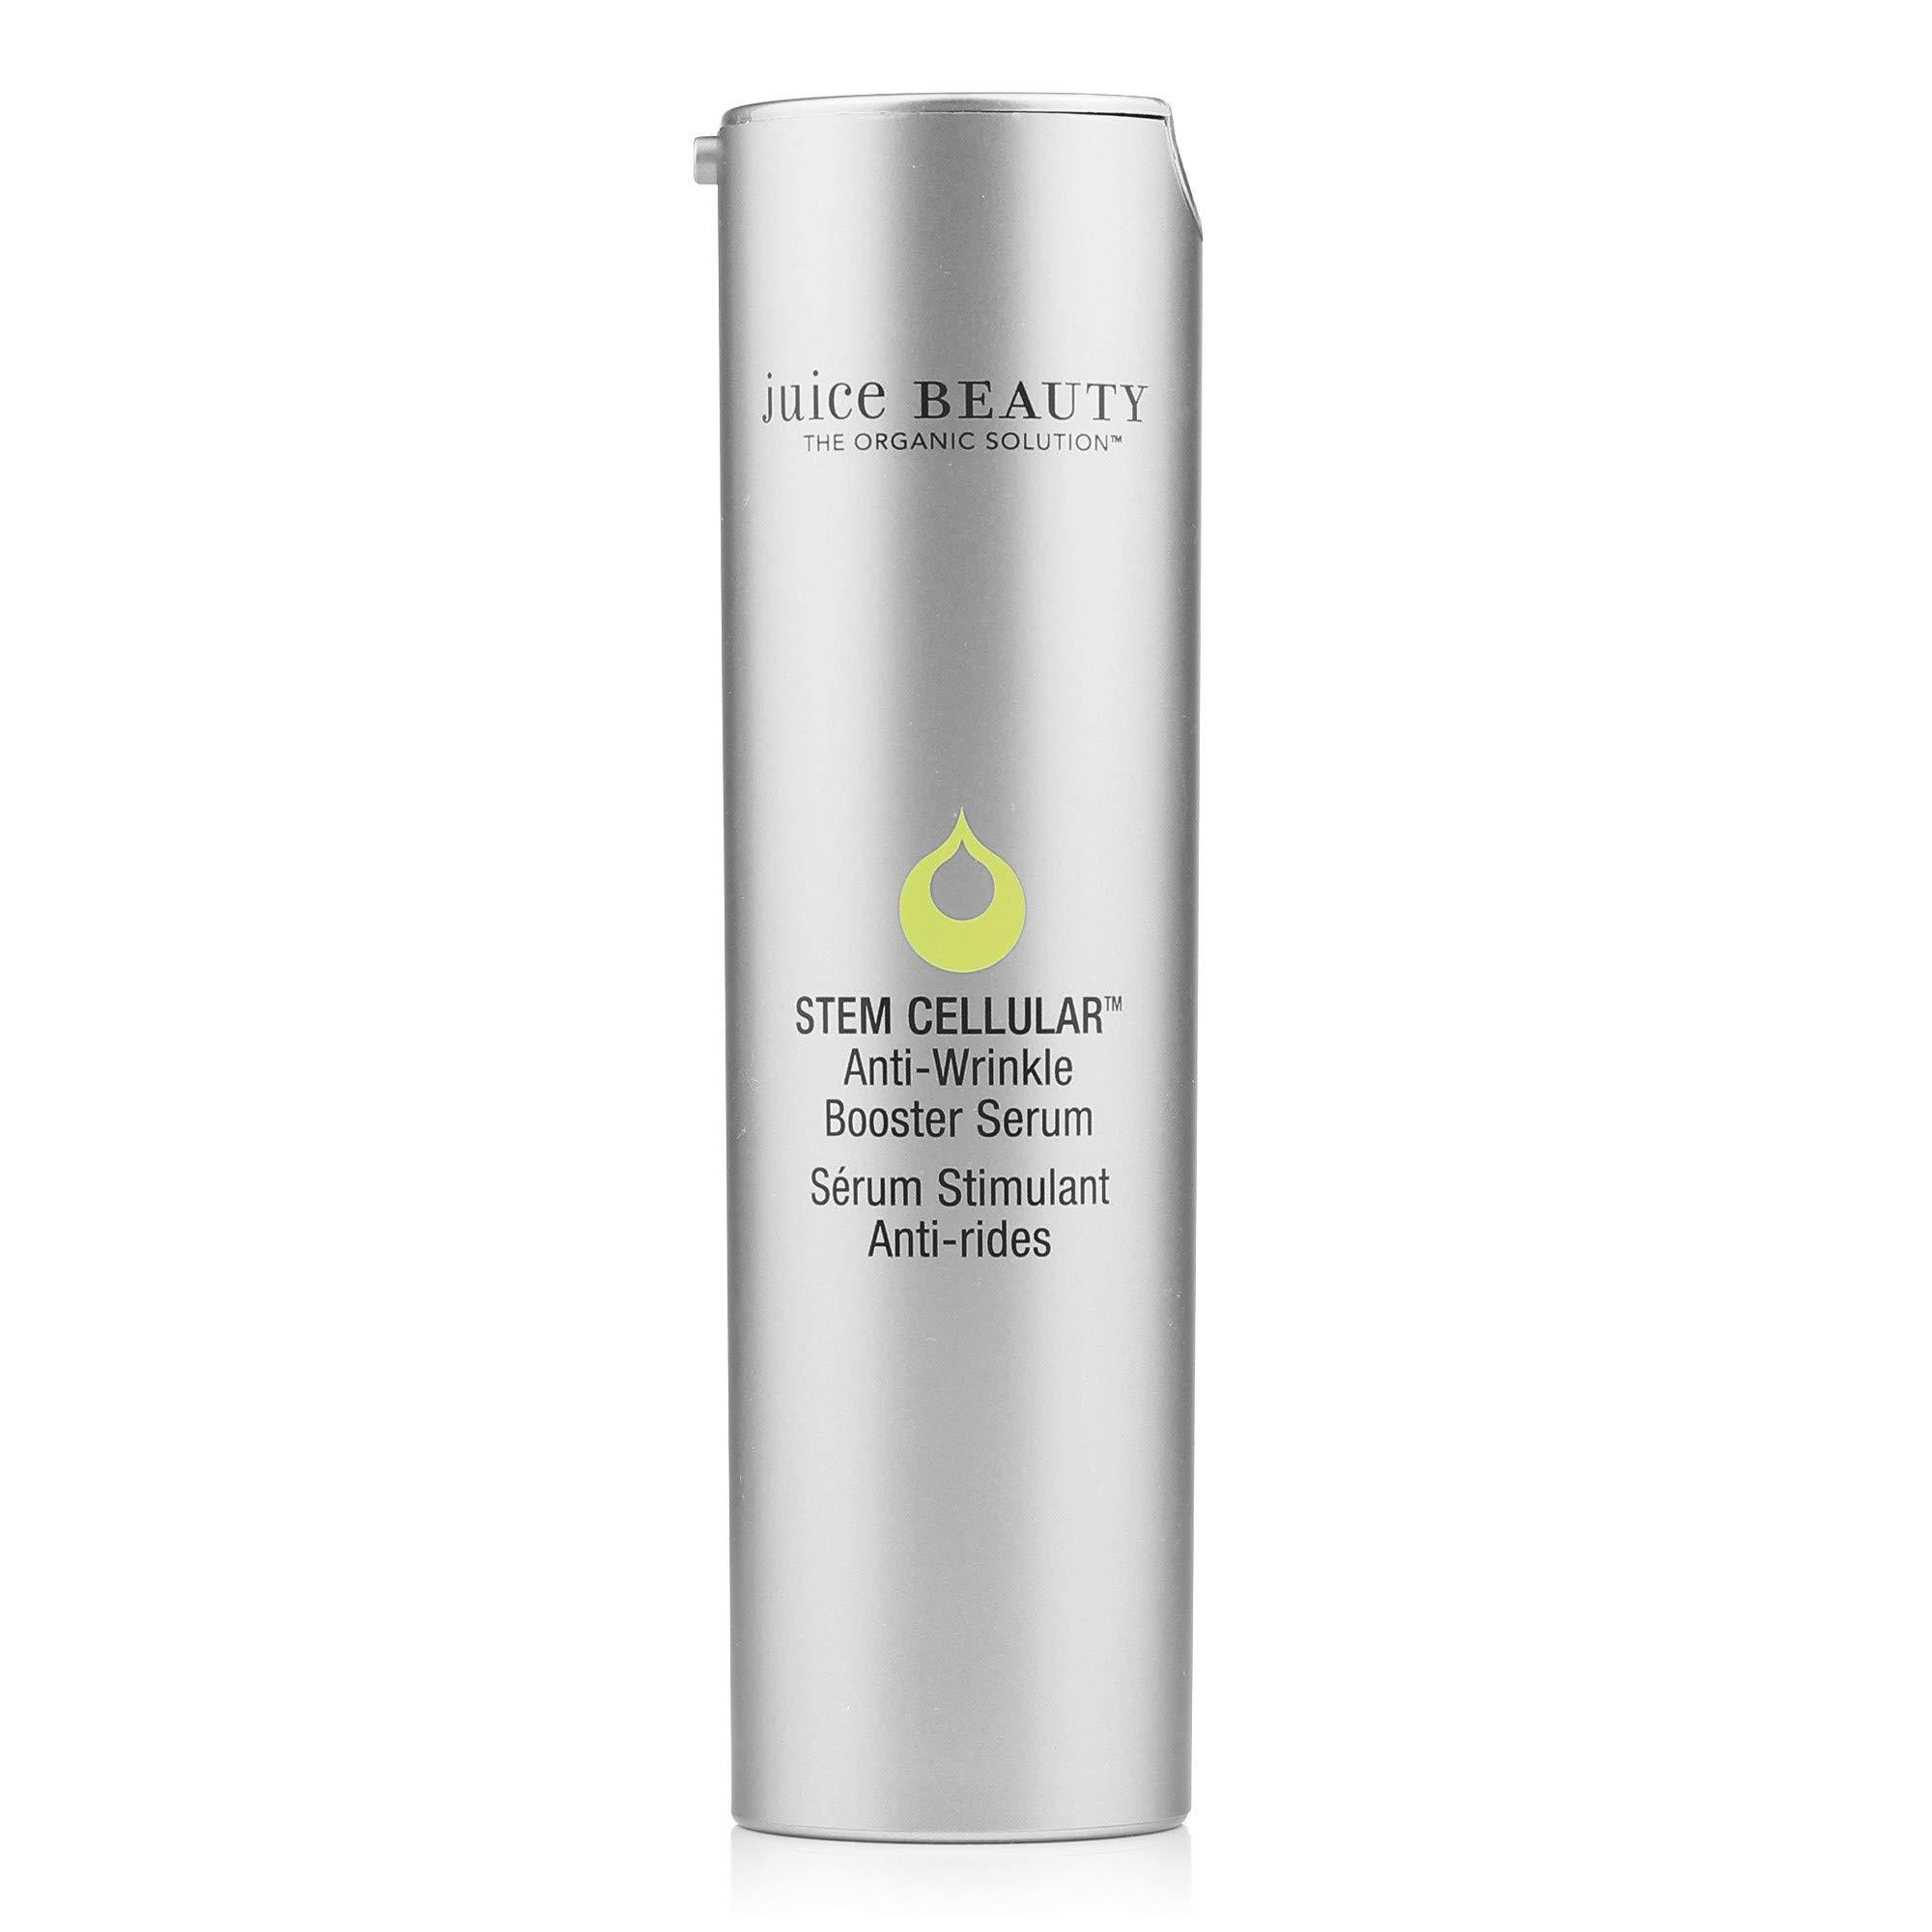 Juice Beauty Stem Cellular Anti-Wrinkle Booster Serum with Vitamin C, 1 Fl Oz